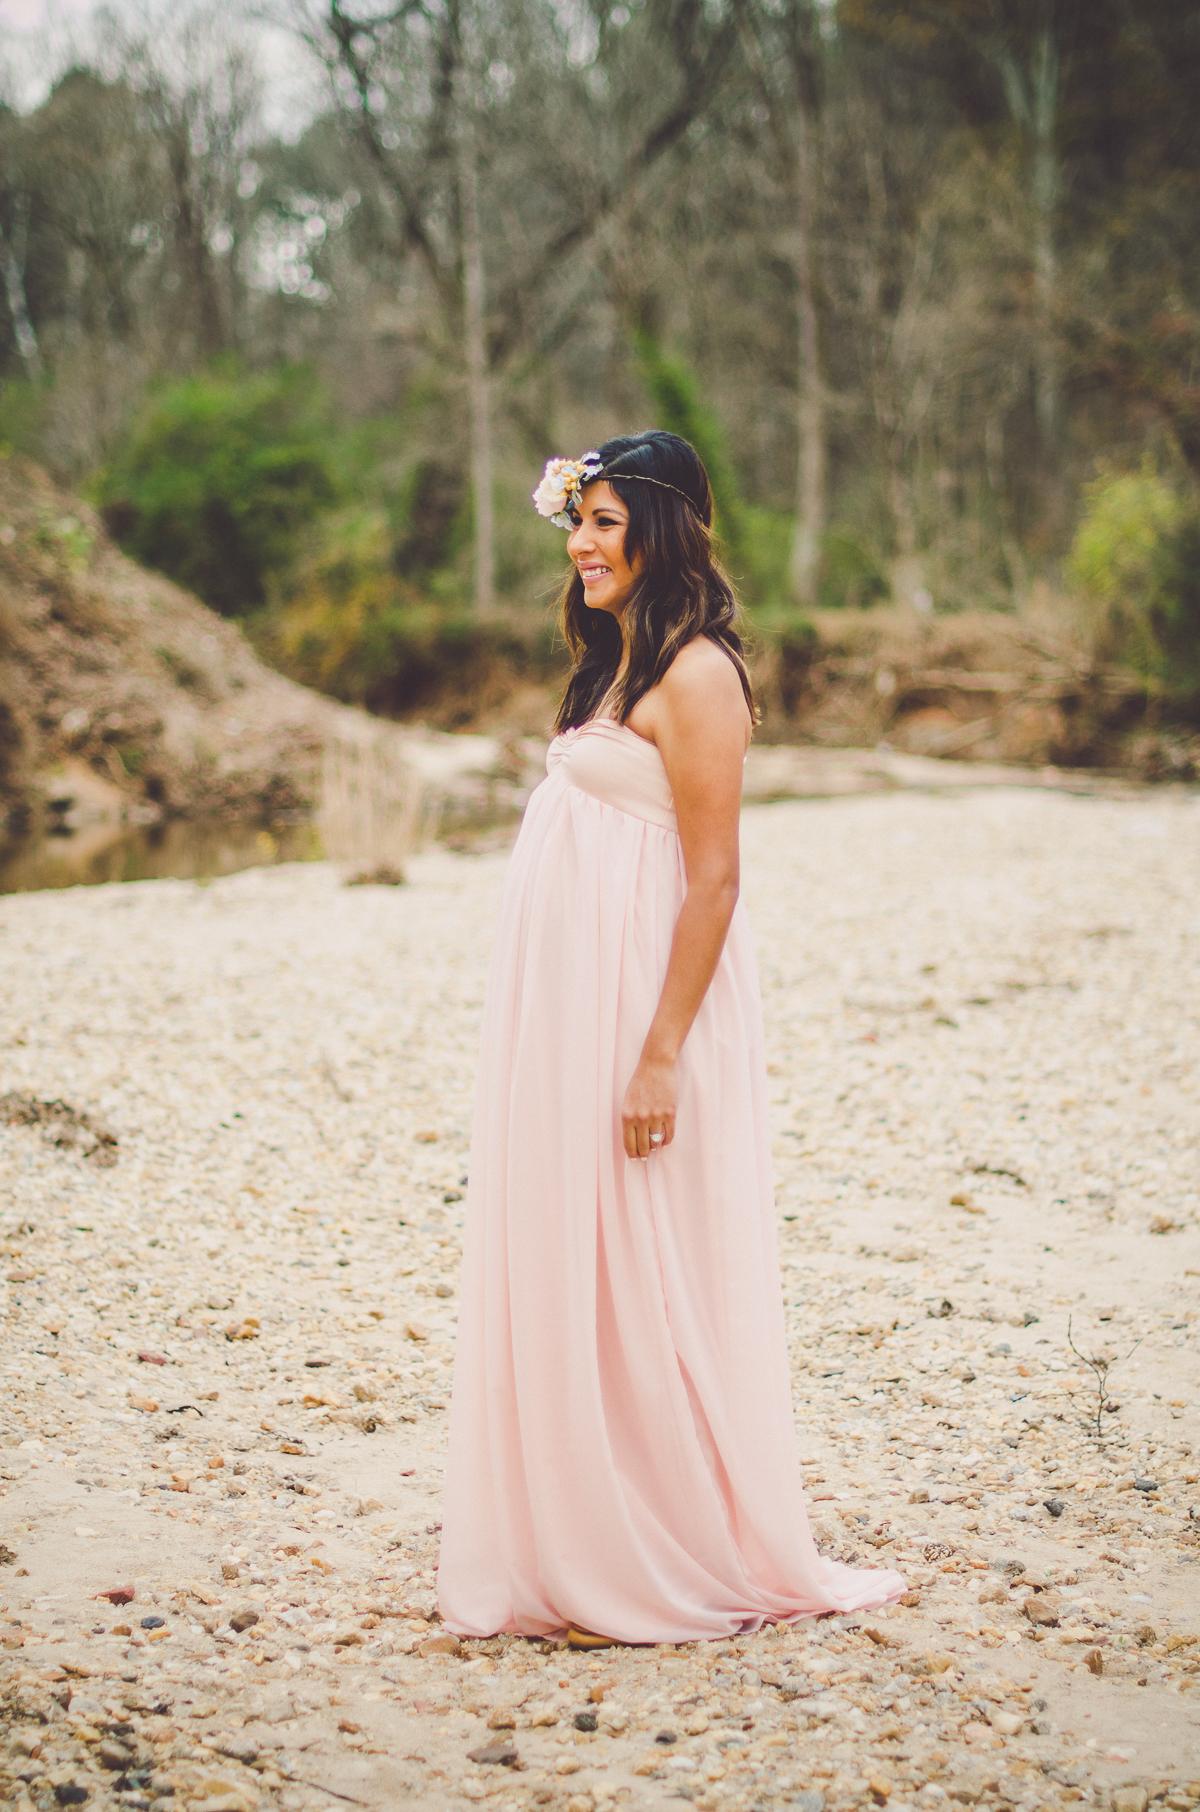 esmeralda-john-kelley-raye-atlanta-lifestyle-photographer-1.jpg